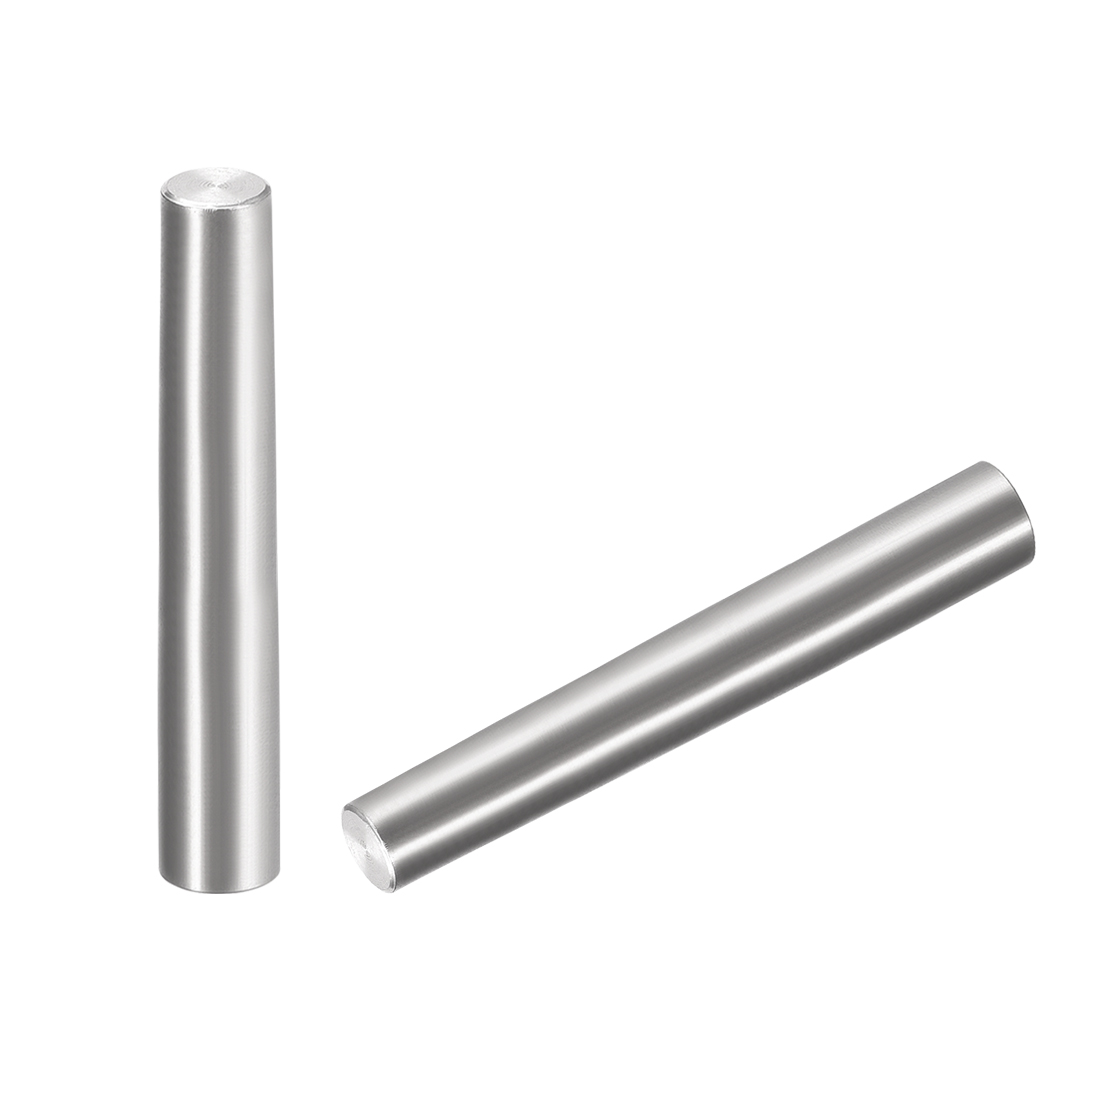 2Pcs 8mm x 60mm 1:50 Taper Pin 304 Stainless Steel Shelf Support Pin Fasten